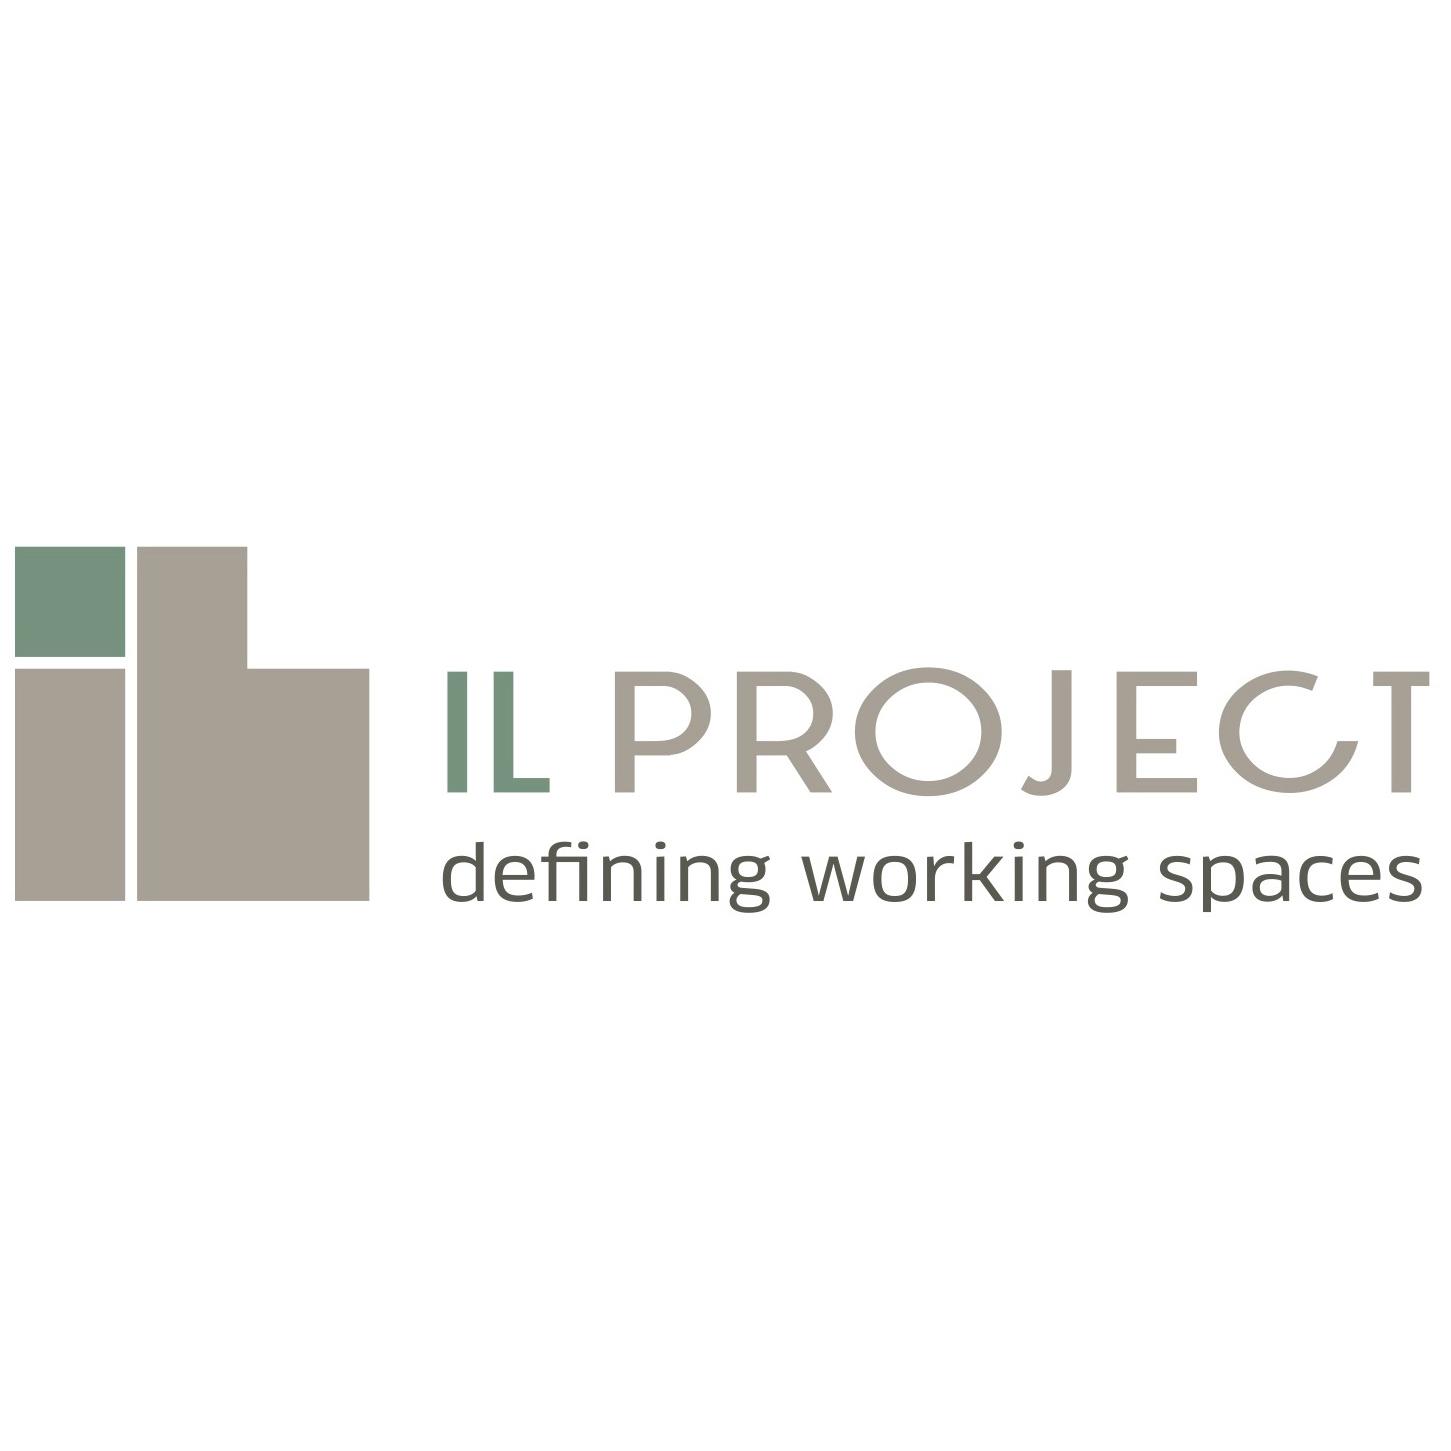 il project